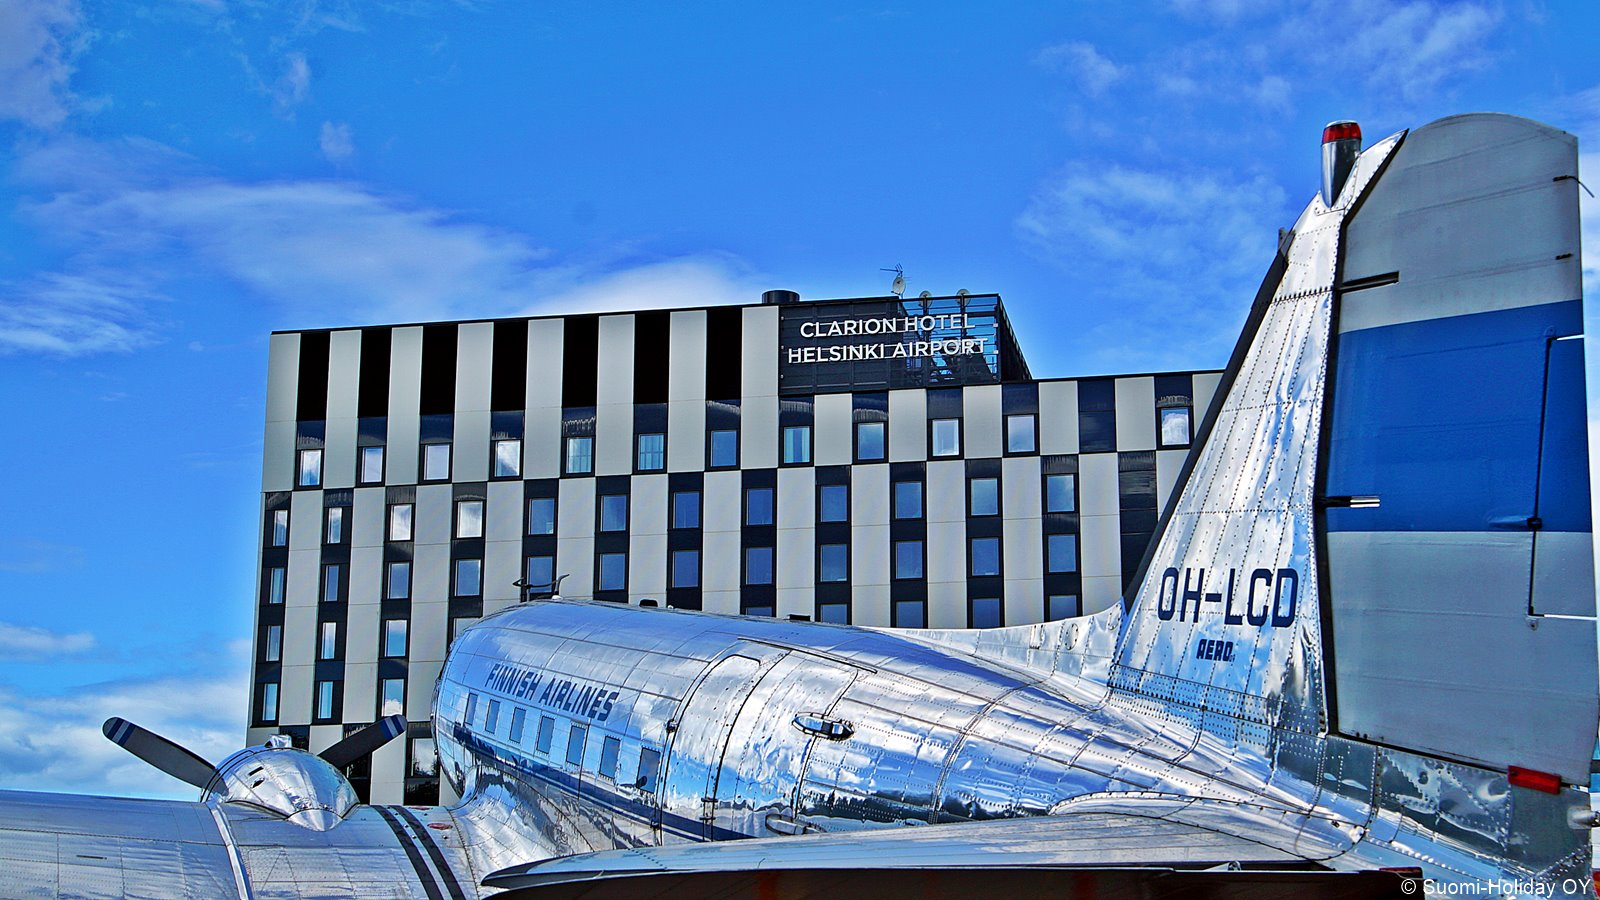 Clarion Hotel аэропорт Хельсинки